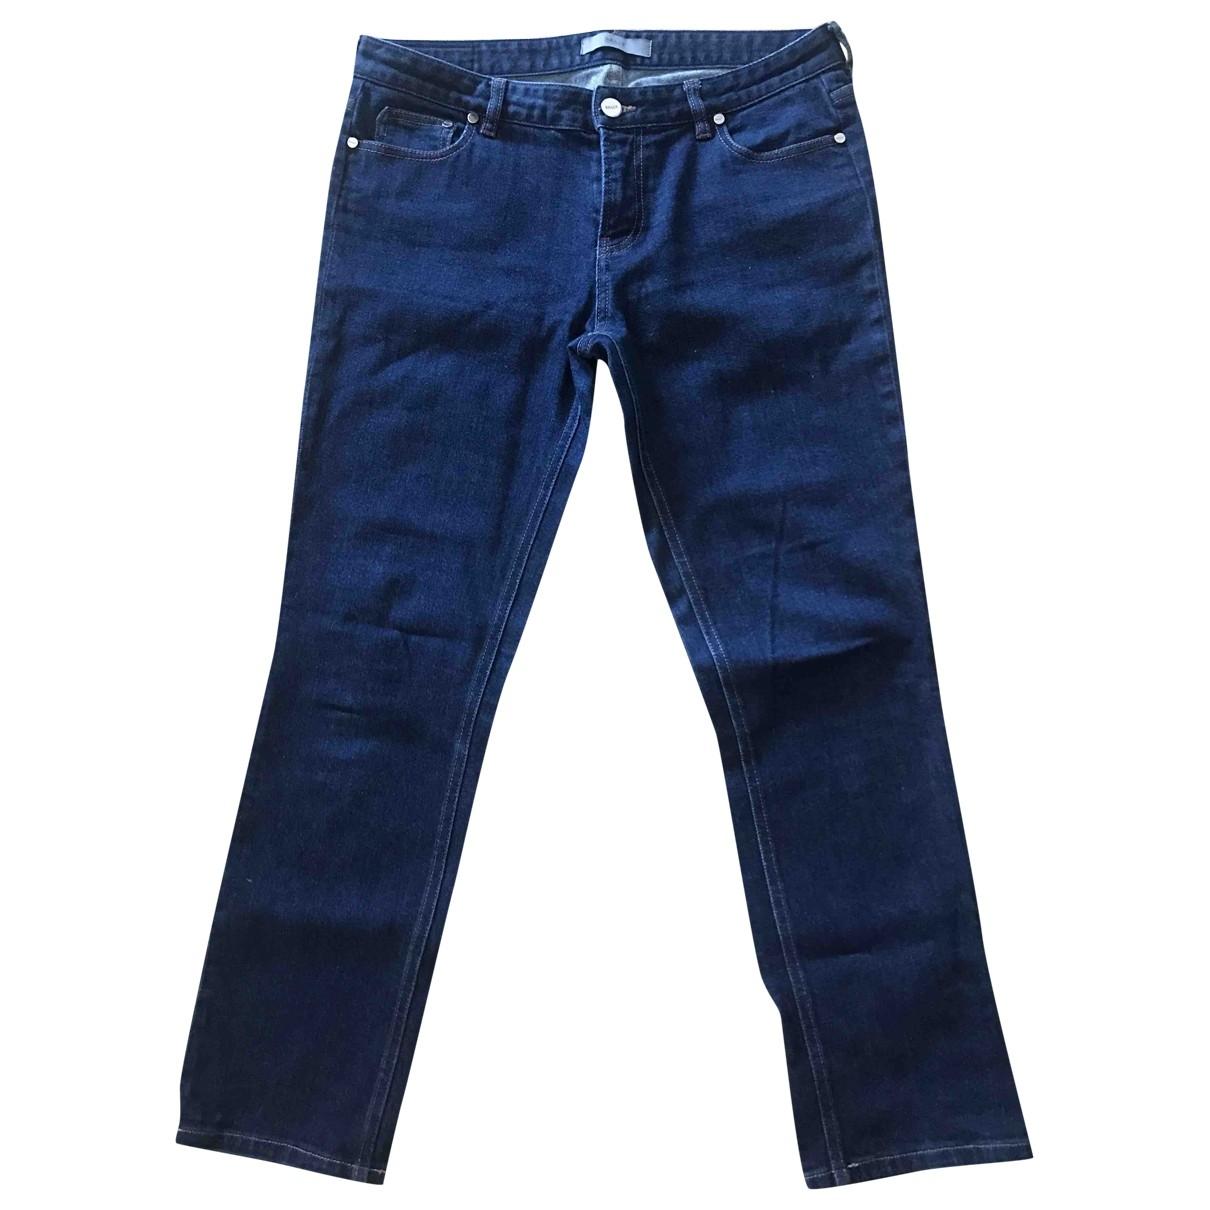 Bally \N Hose in  Blau Denim - Jeans